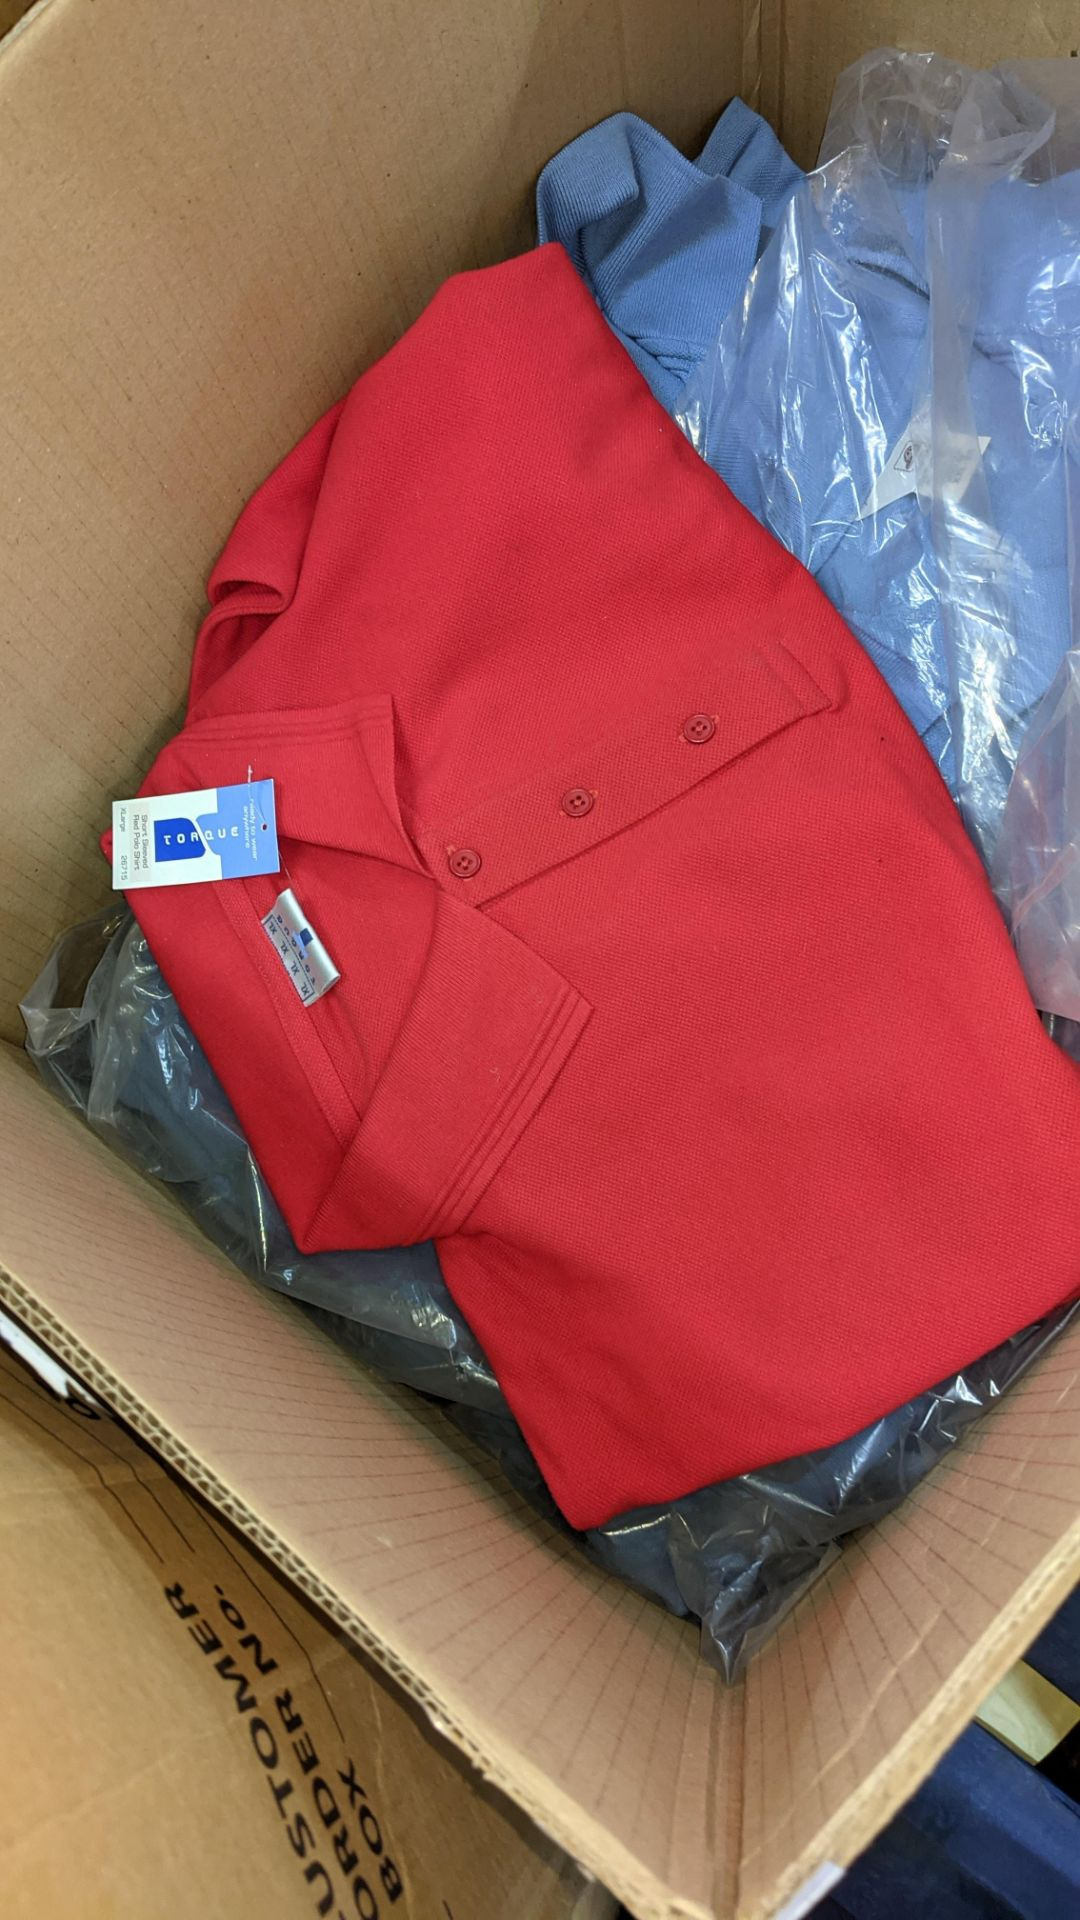 20 assorted polo shirts - 1 large box - Image 4 of 5